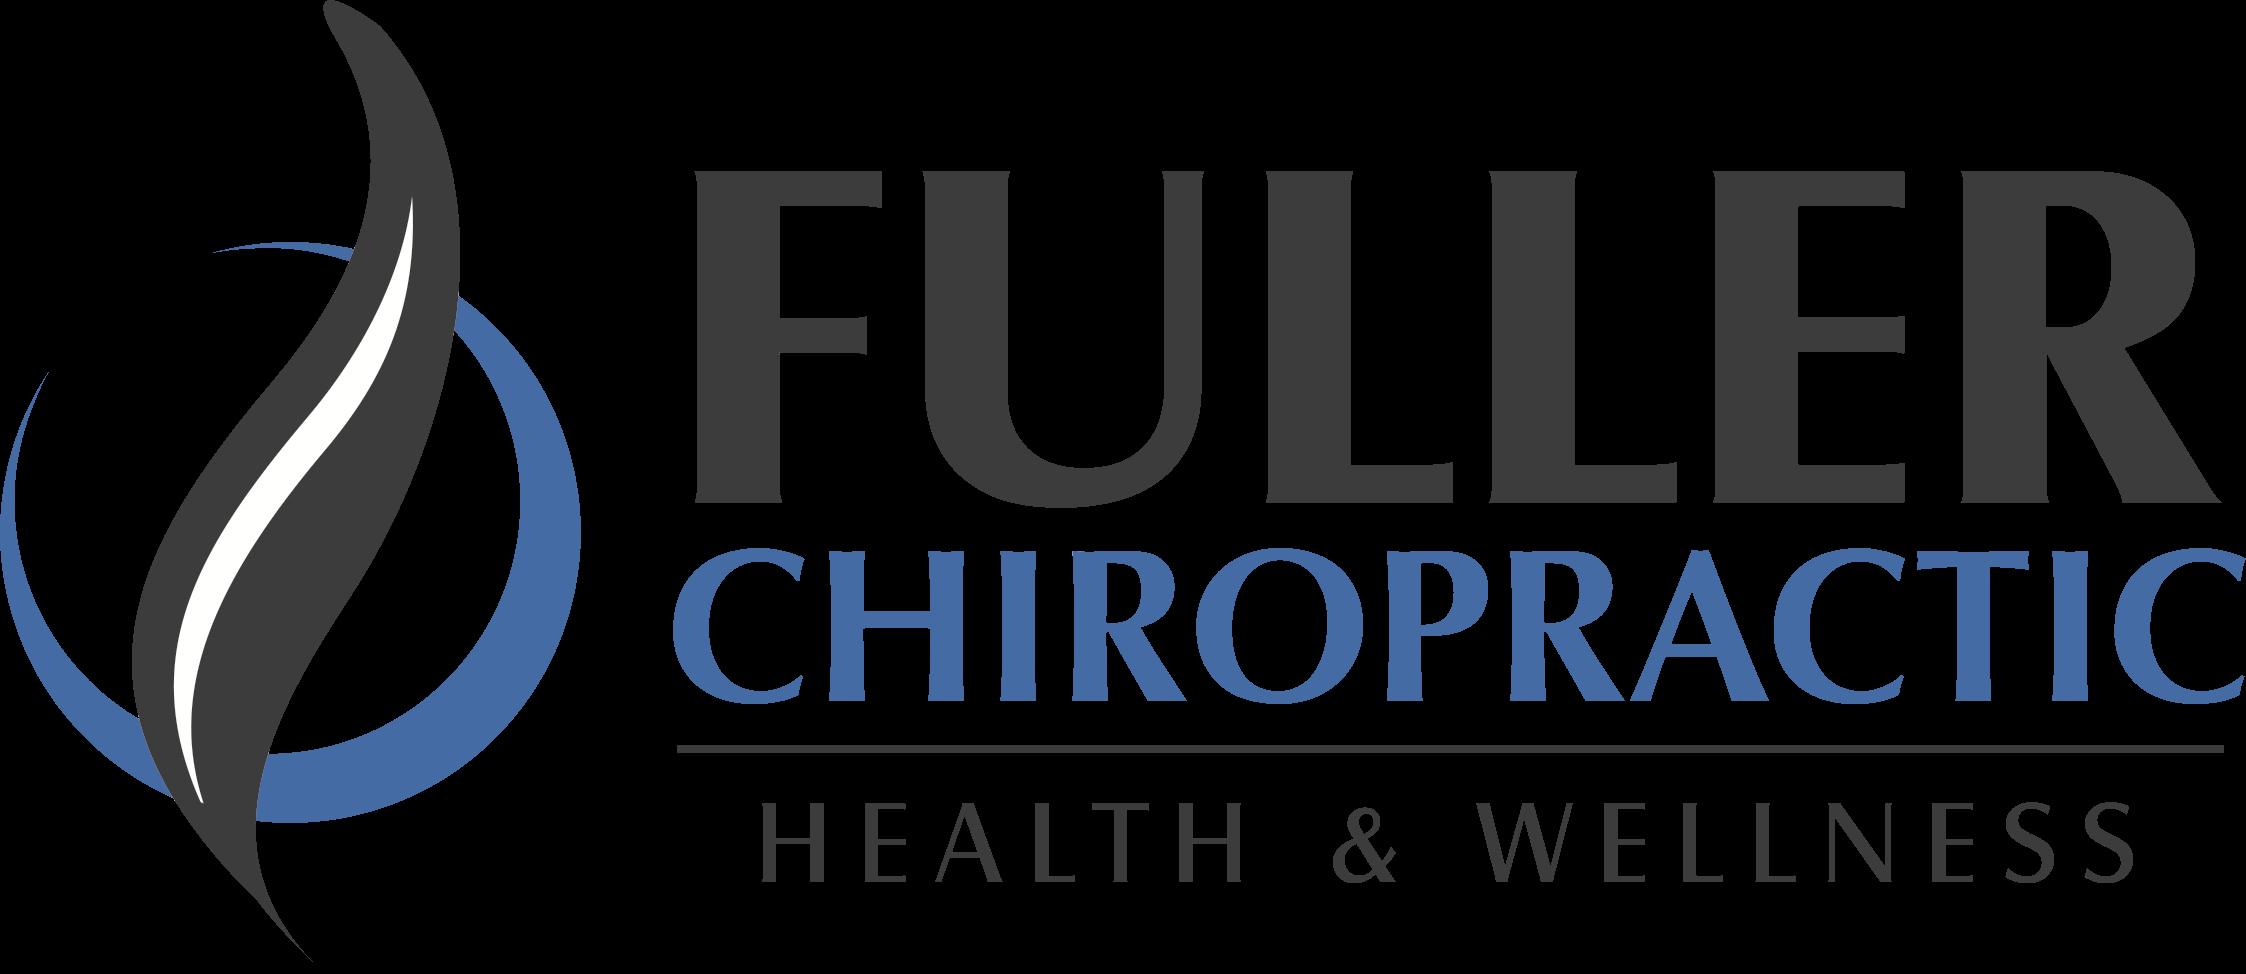 Fuller Chiropractic Clinic Dr. Garry Fuller